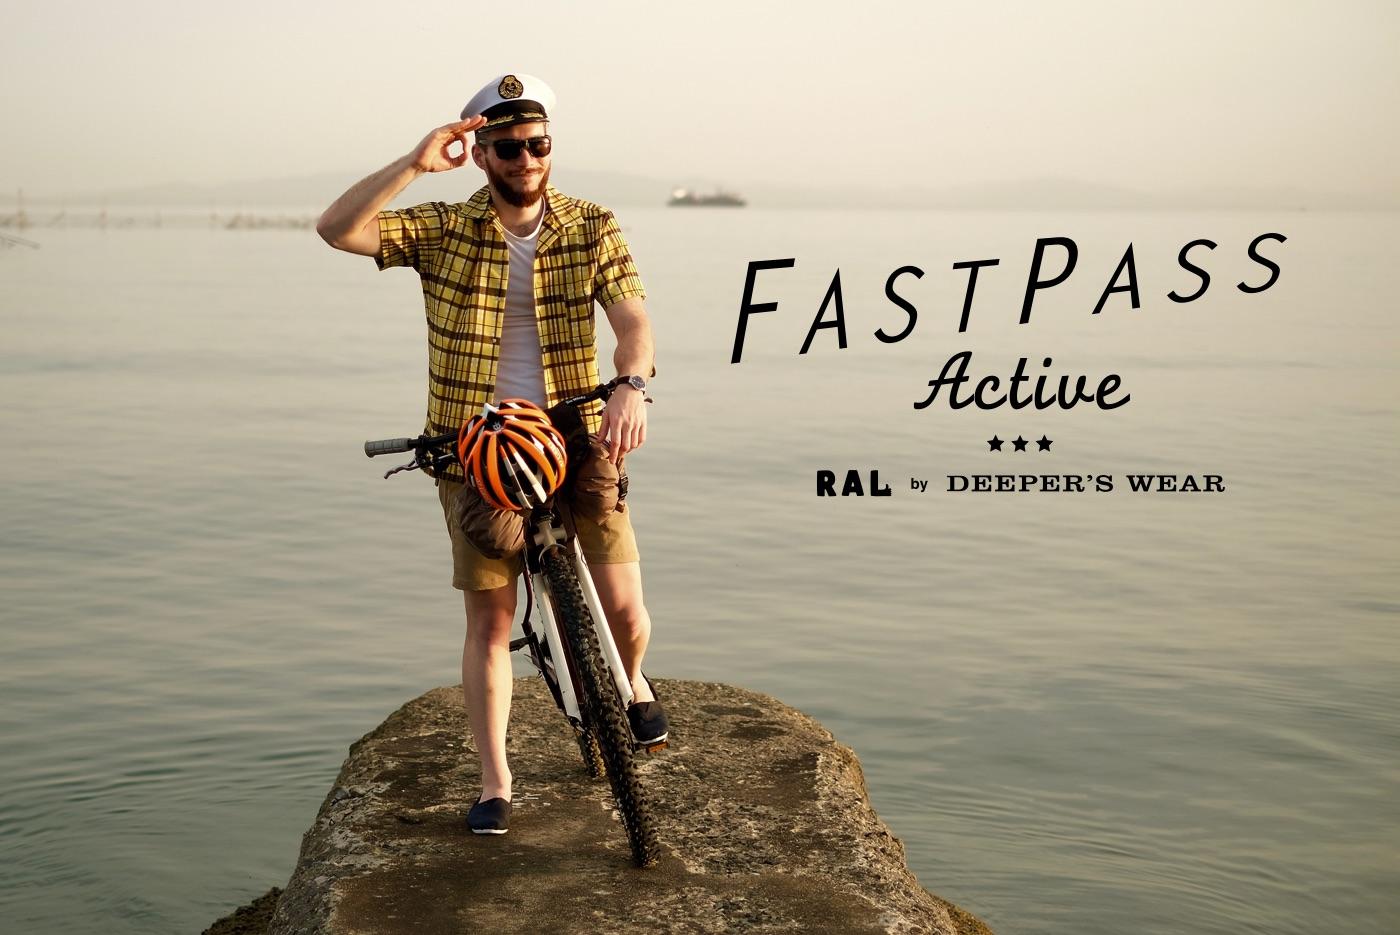 FastPass Active